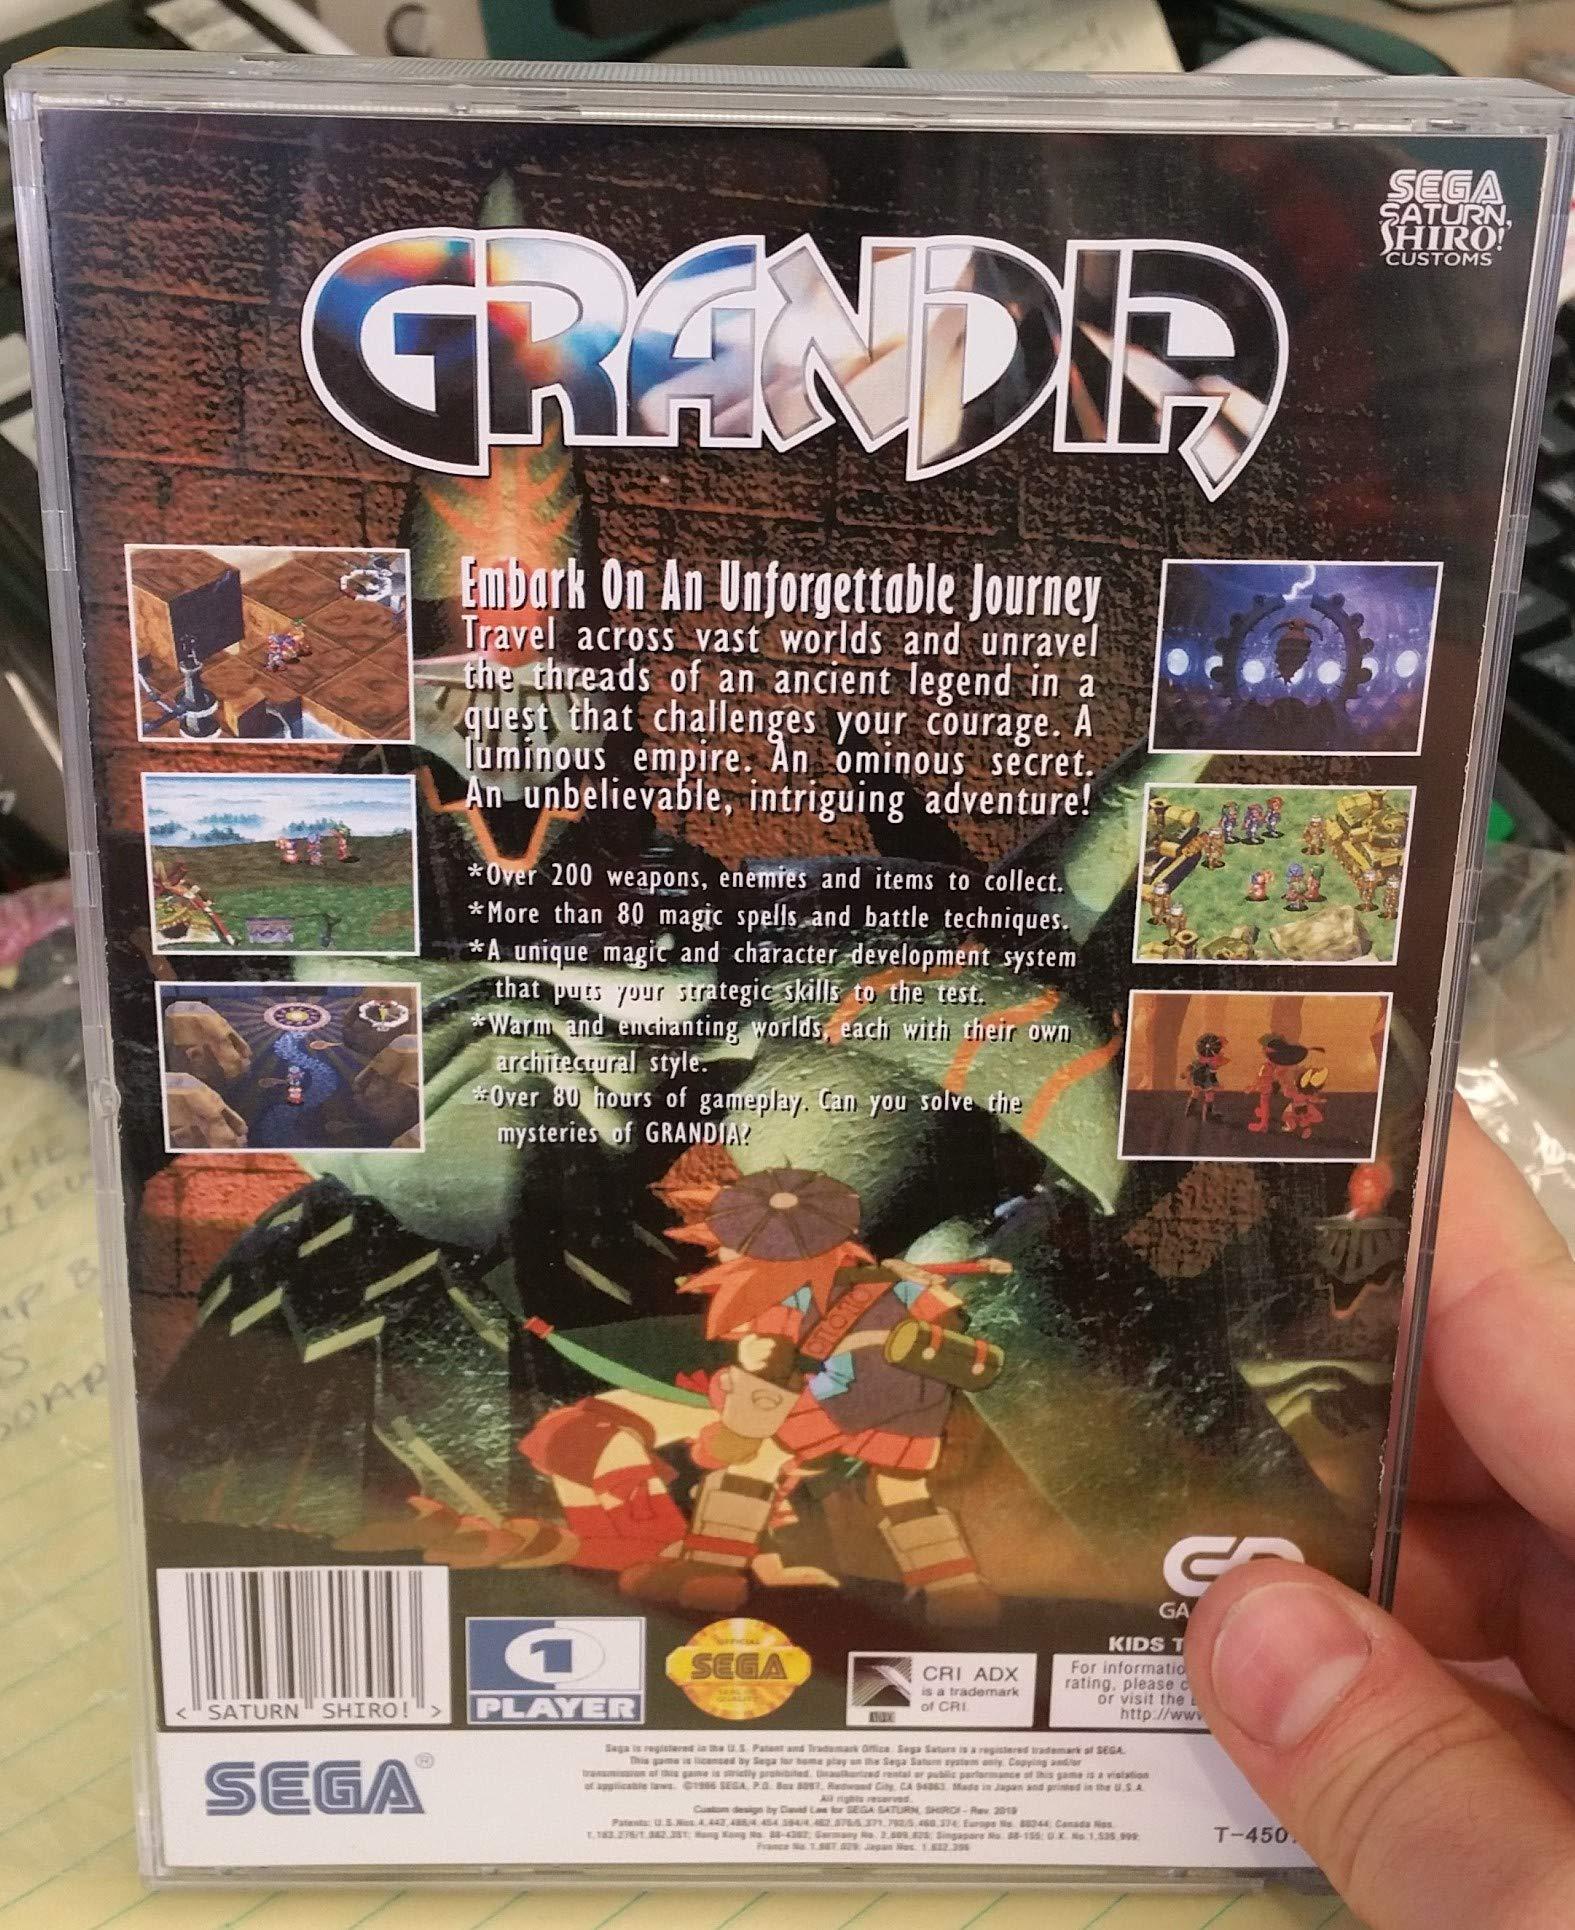 Sega CD / Sega Saturn replacement game cases 10 pack **SECOND RUN** by VGC online (Image #1)